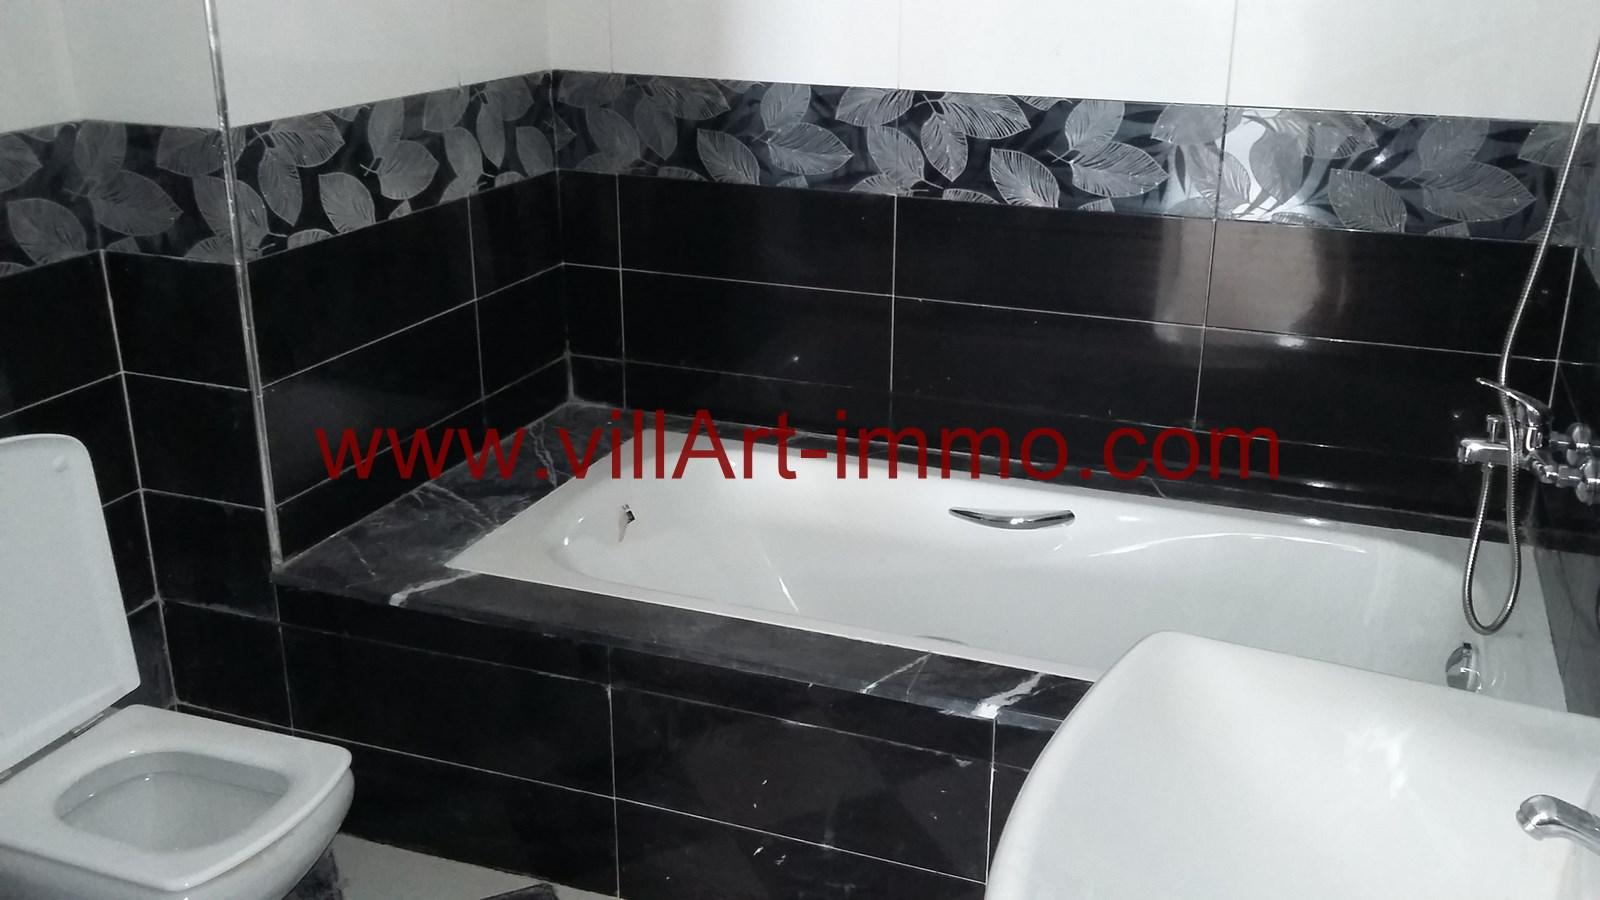 7-location-appartement-non-meuble-tanger-salle-de-bain-2-l880-villart-immo